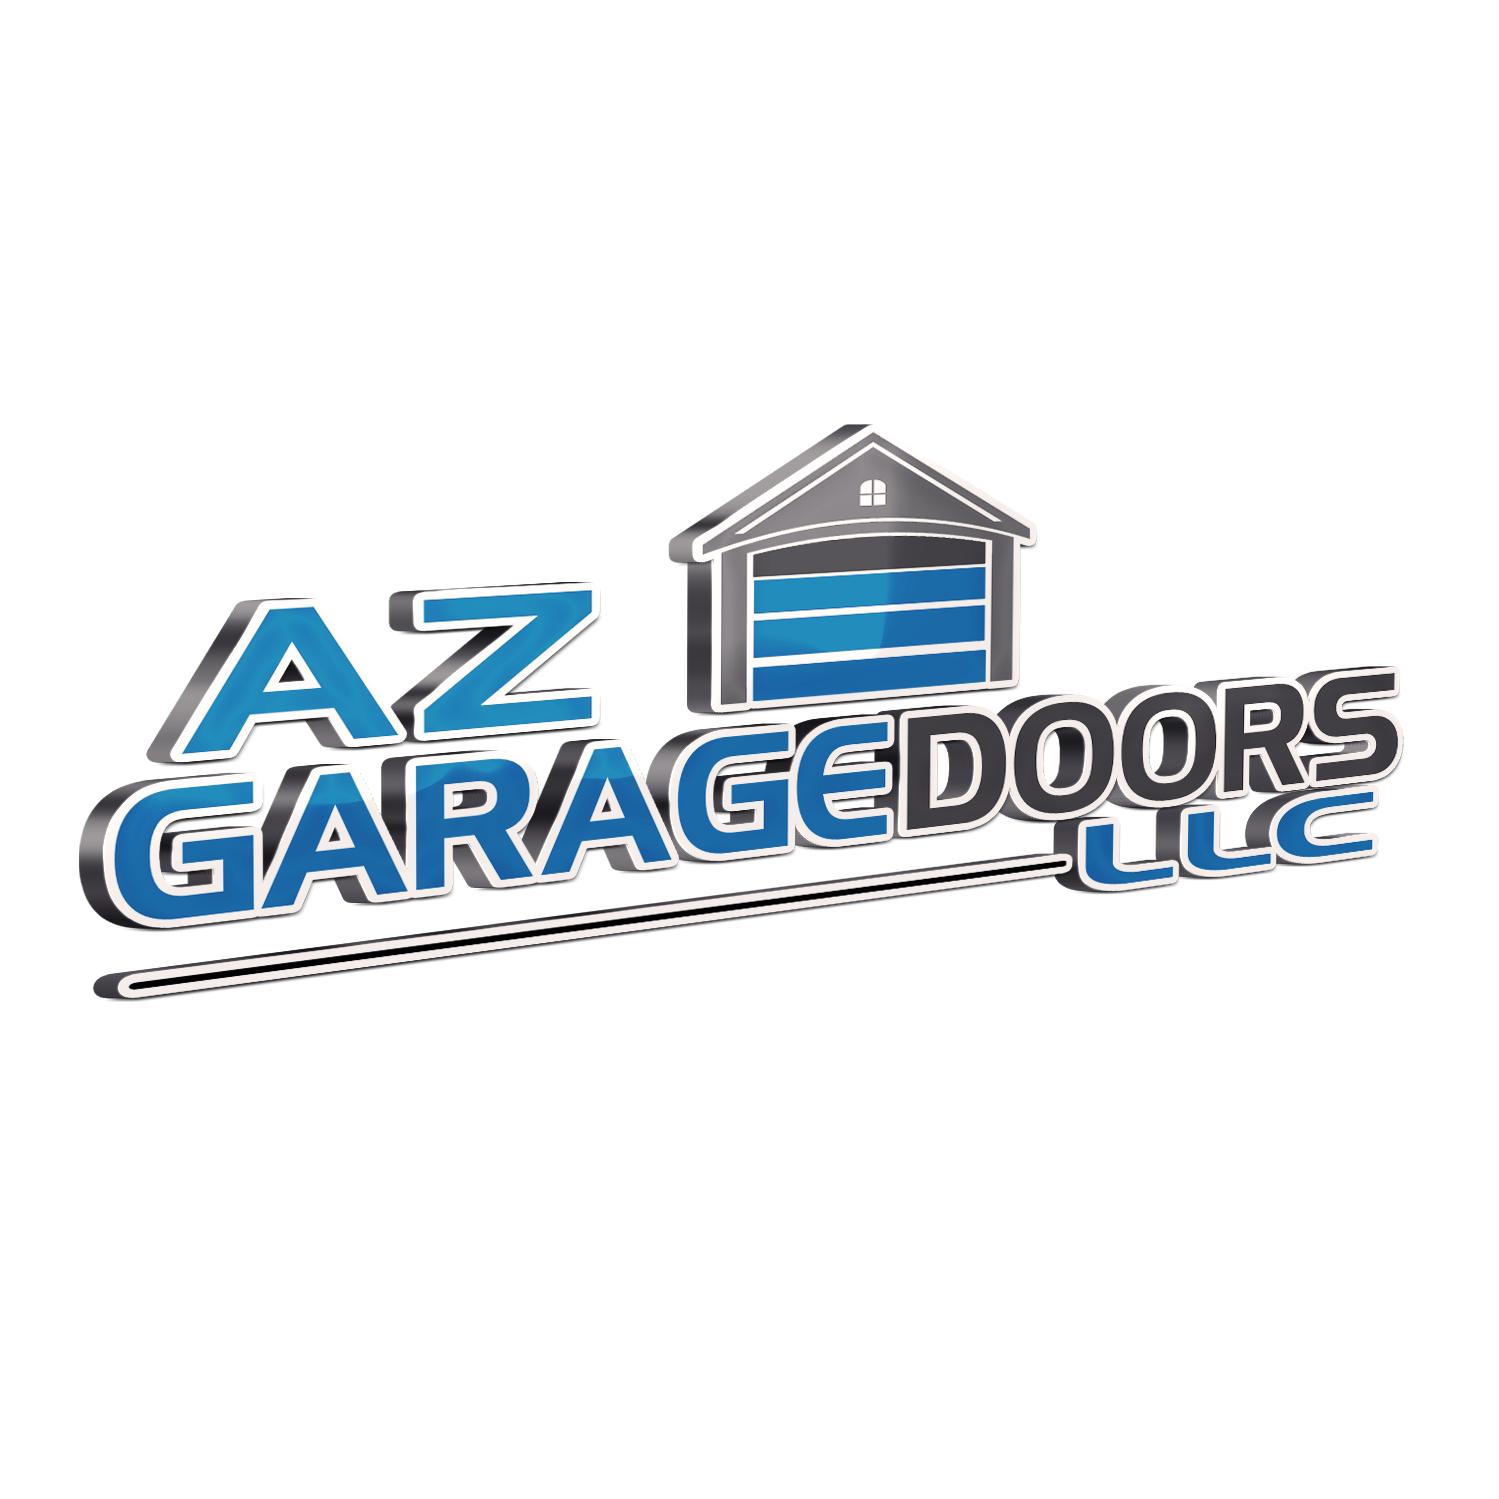 AZ Garage Doors LLC